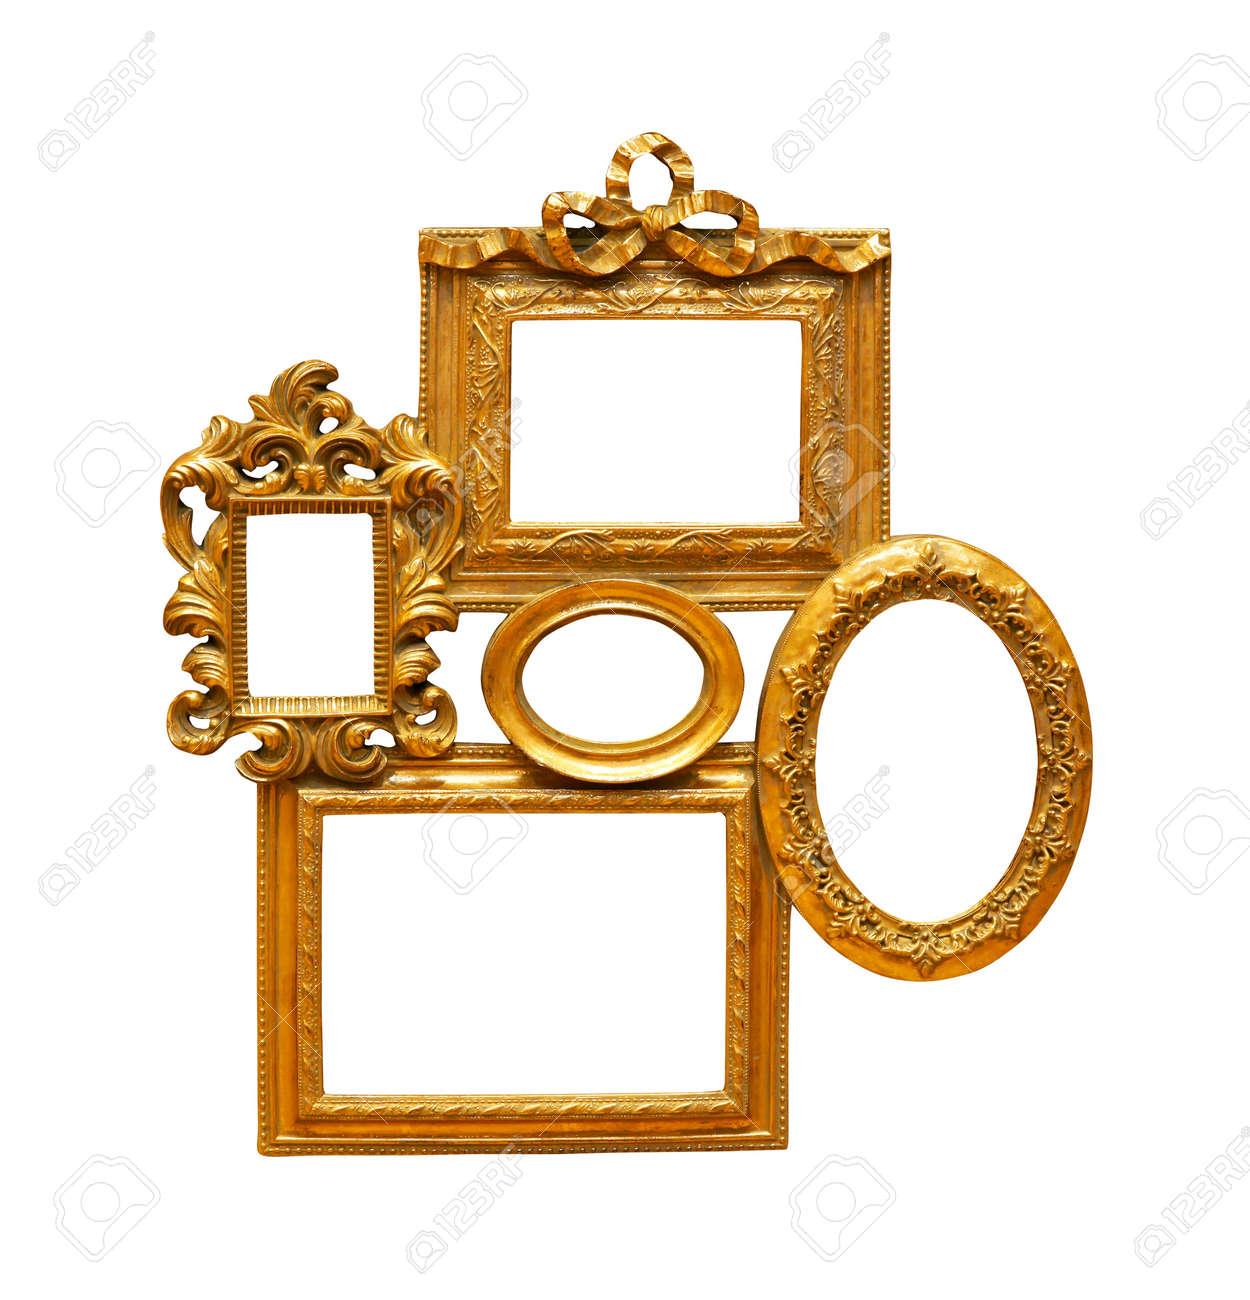 collage of decorative frames stock photo 9149756 - Decorative Frames